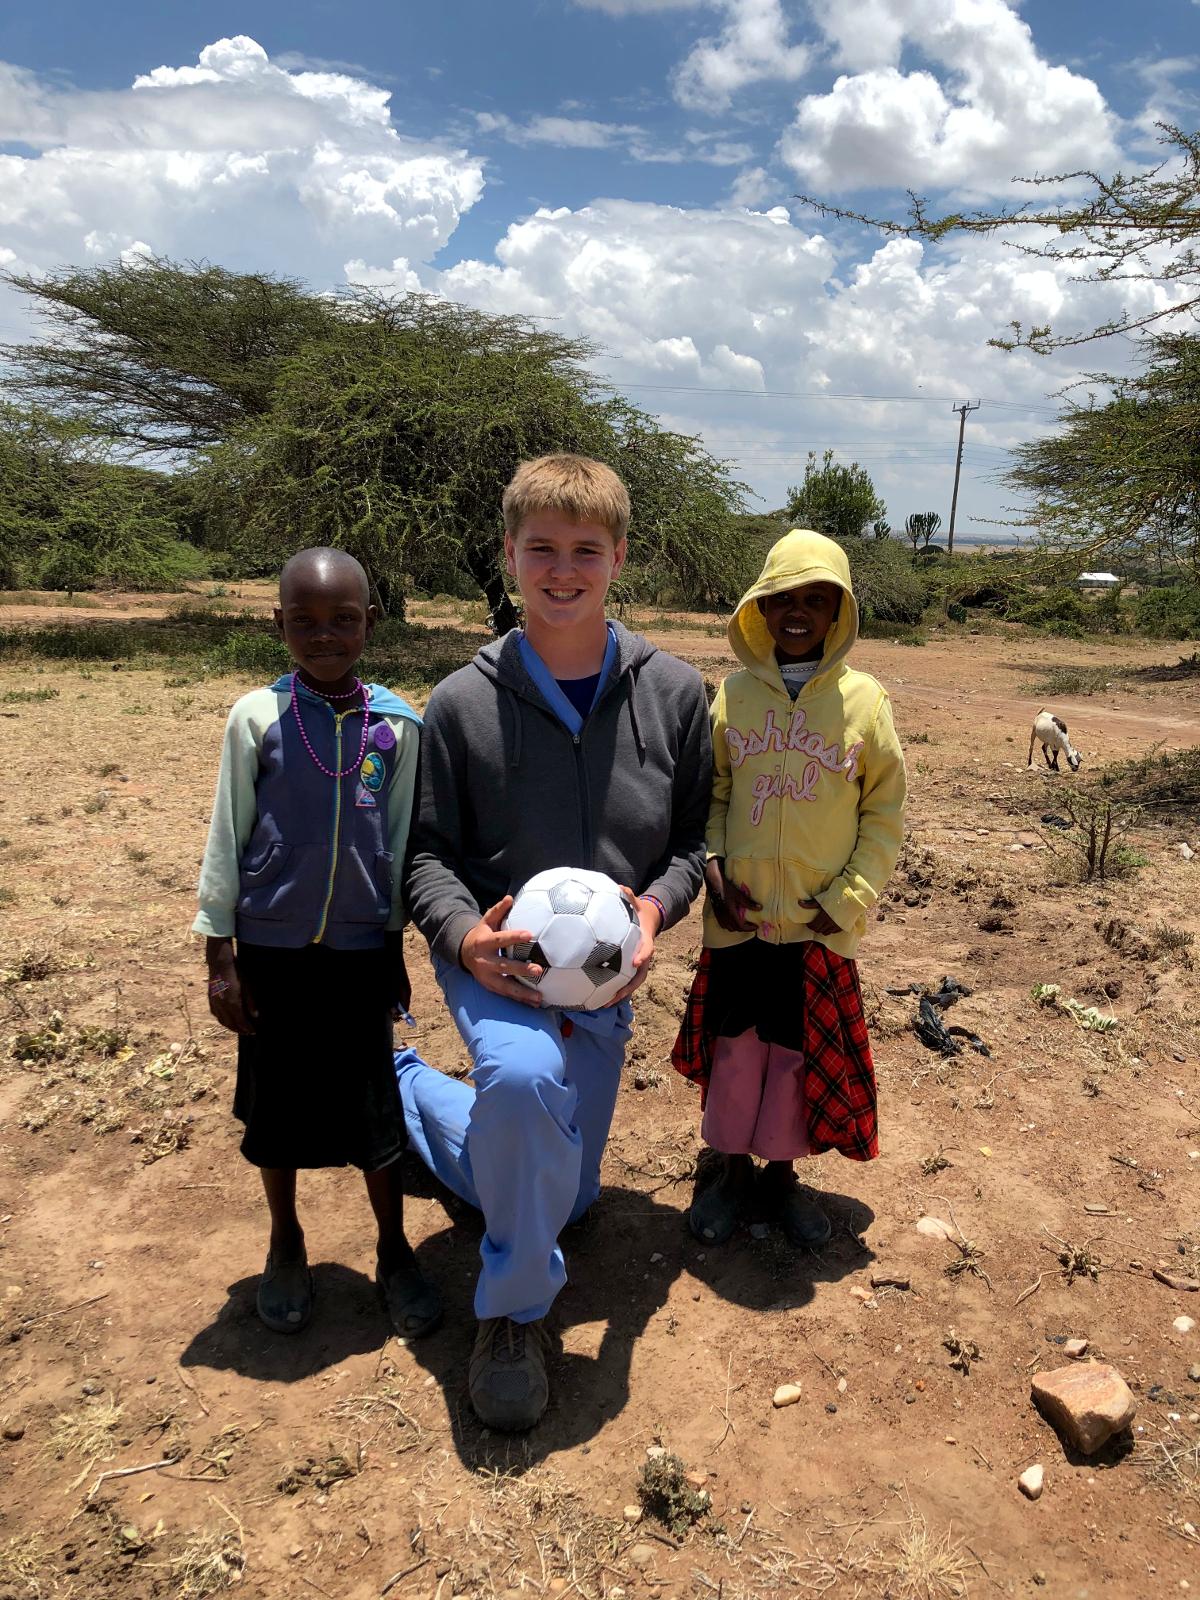 brad soccer with kids